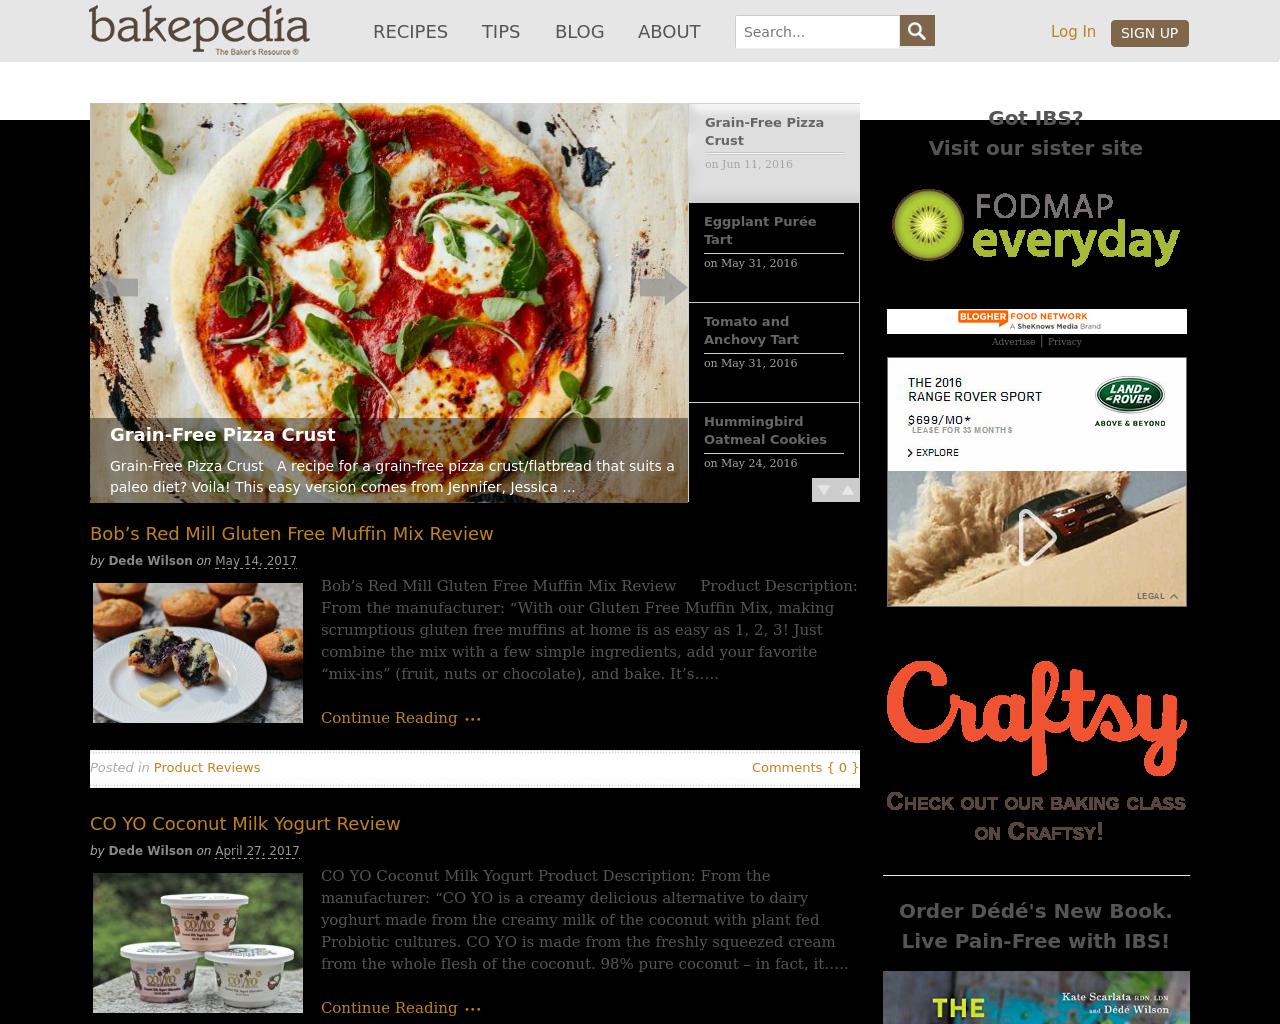 Bakepedia-Advertising-Reviews-Pricing